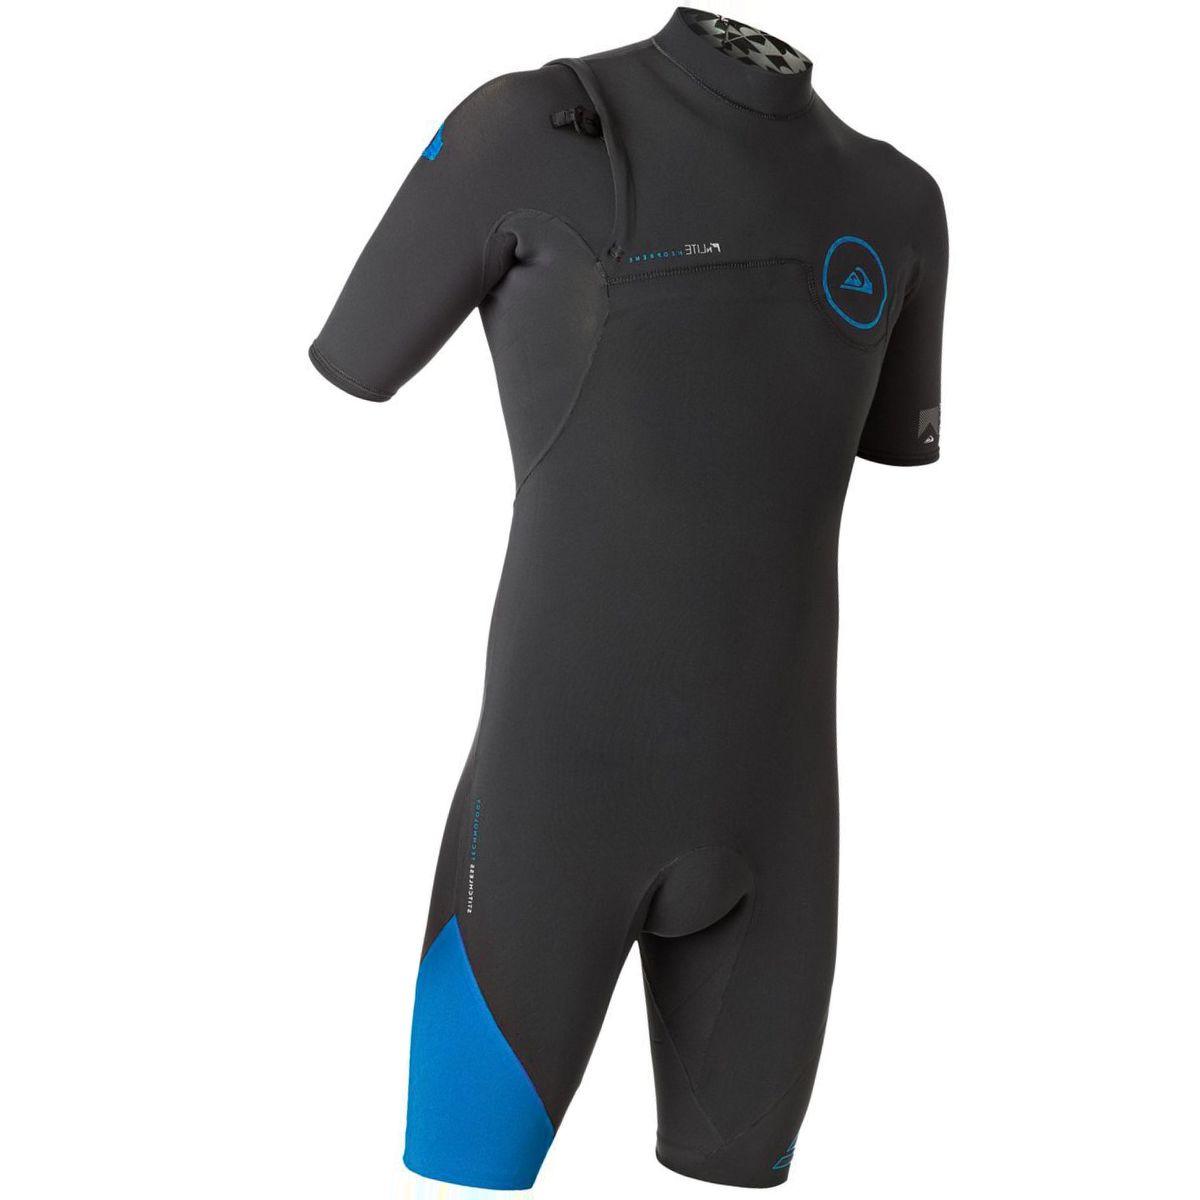 Quiksilver 2/2 Highline Zipperless Short-Sleeve Spring Wetsuit - Men's